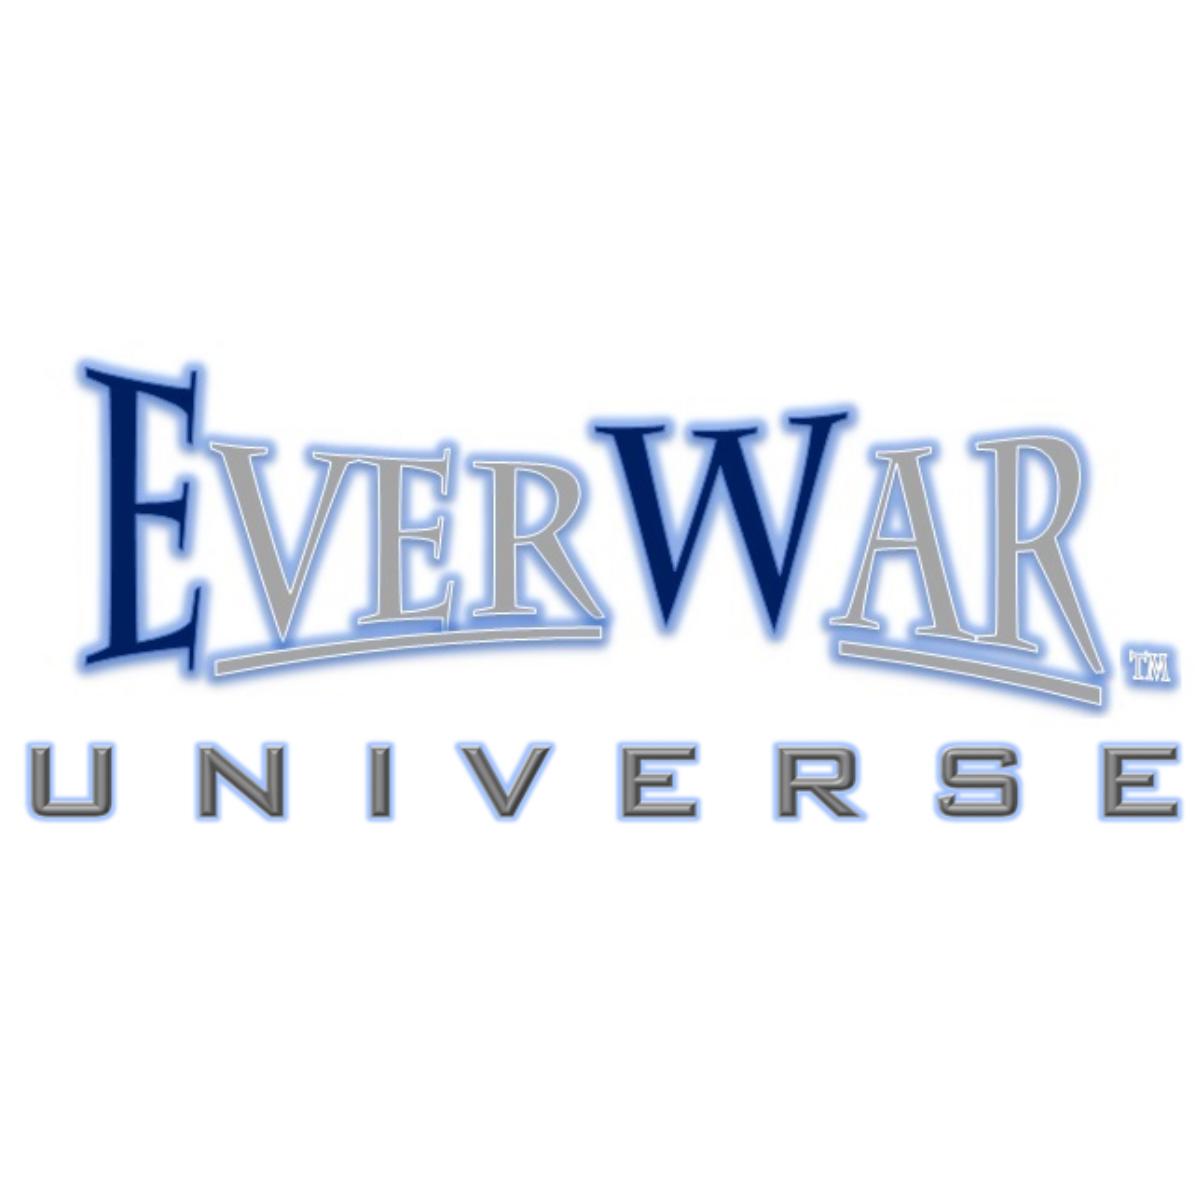 EVERWAR UNIVERSE